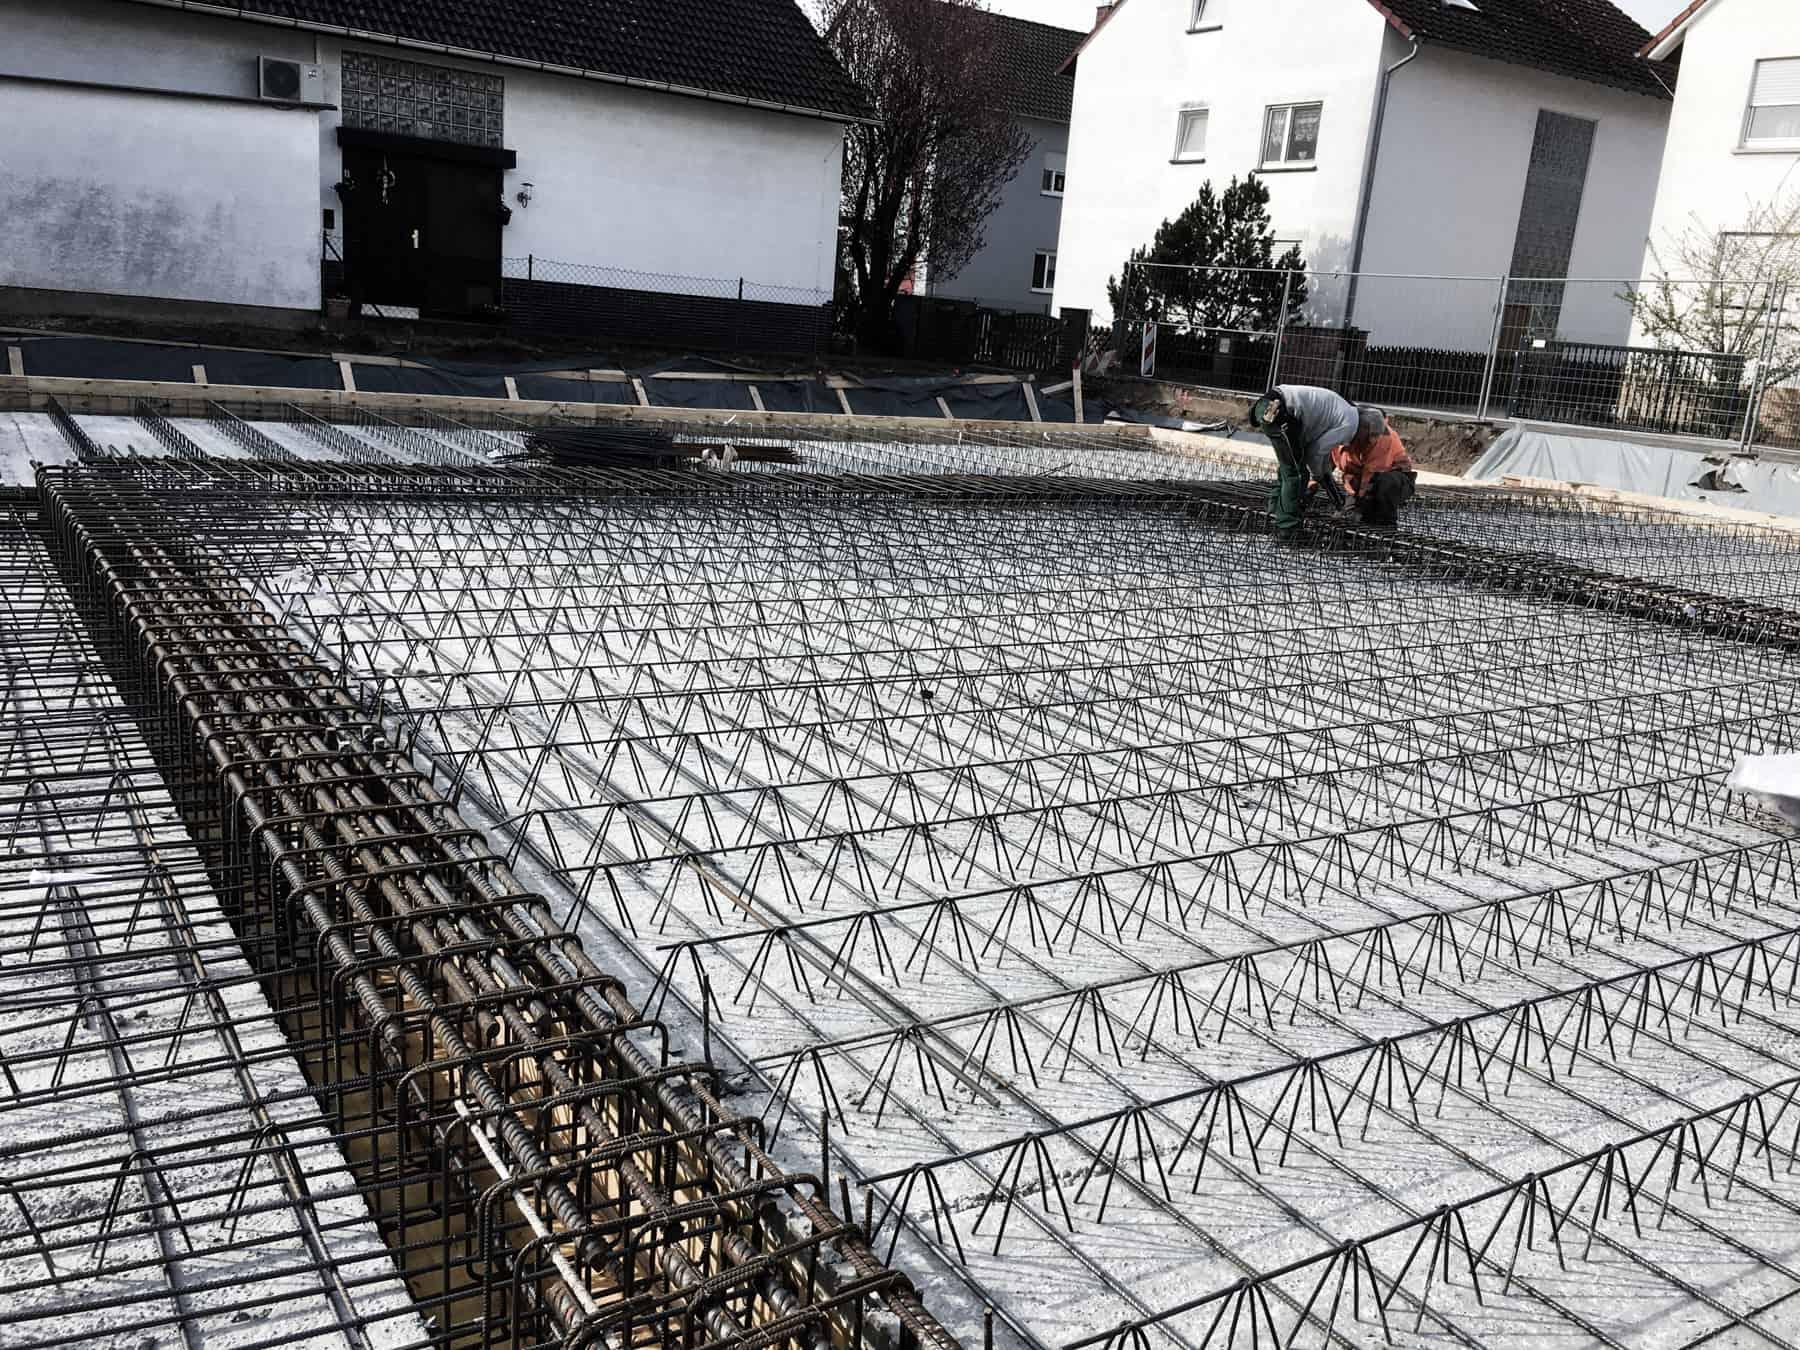 Ingenieurbüro Nebel - Ingenieurbüro Mespelbrunn - Projekt - Mehrfamilienhaus Griesheim